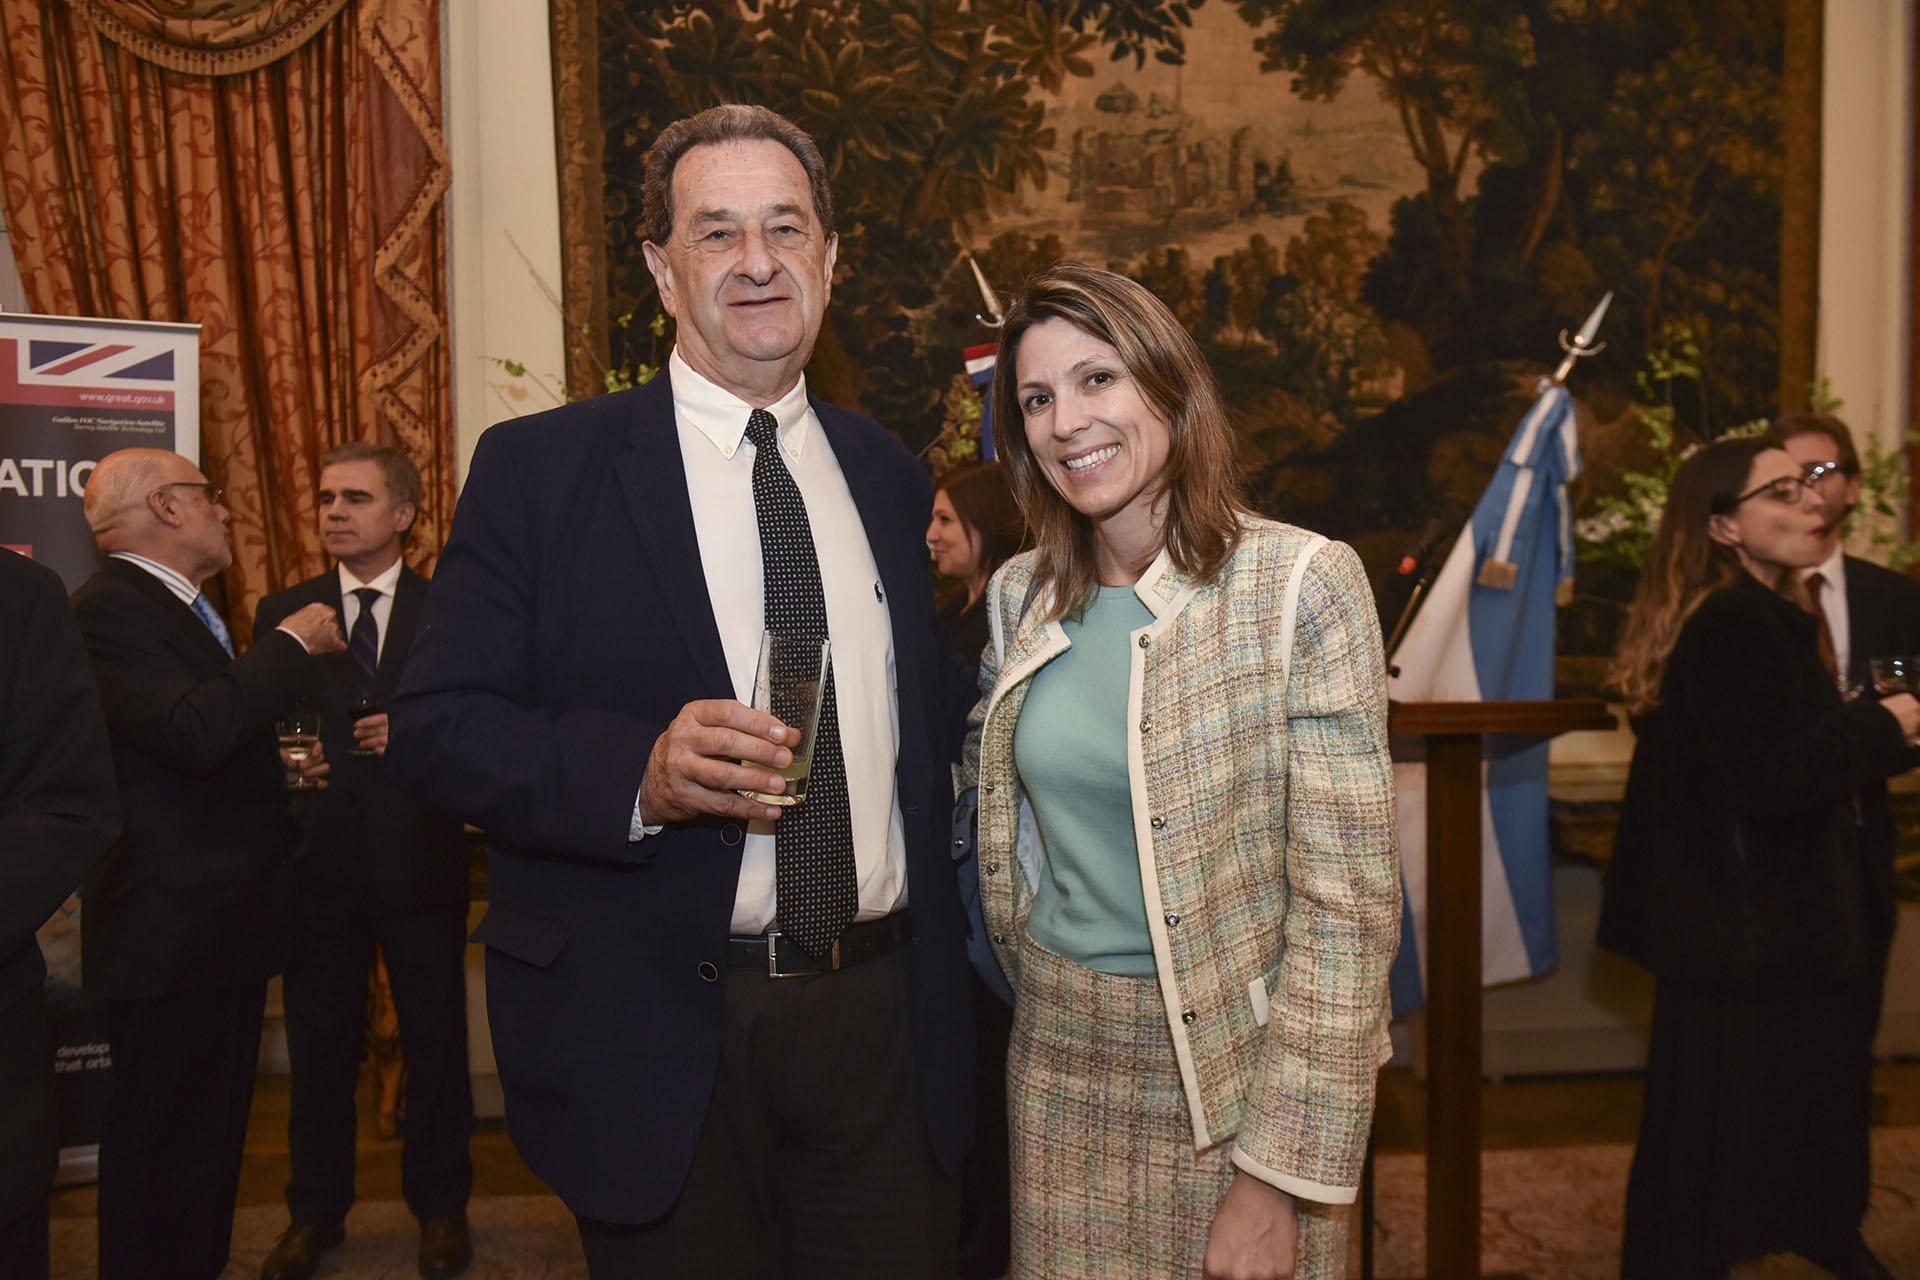 Bernardo Kosacoff e Isela Costantini, distinguida en la disciplina Ejecutivos de la Industria